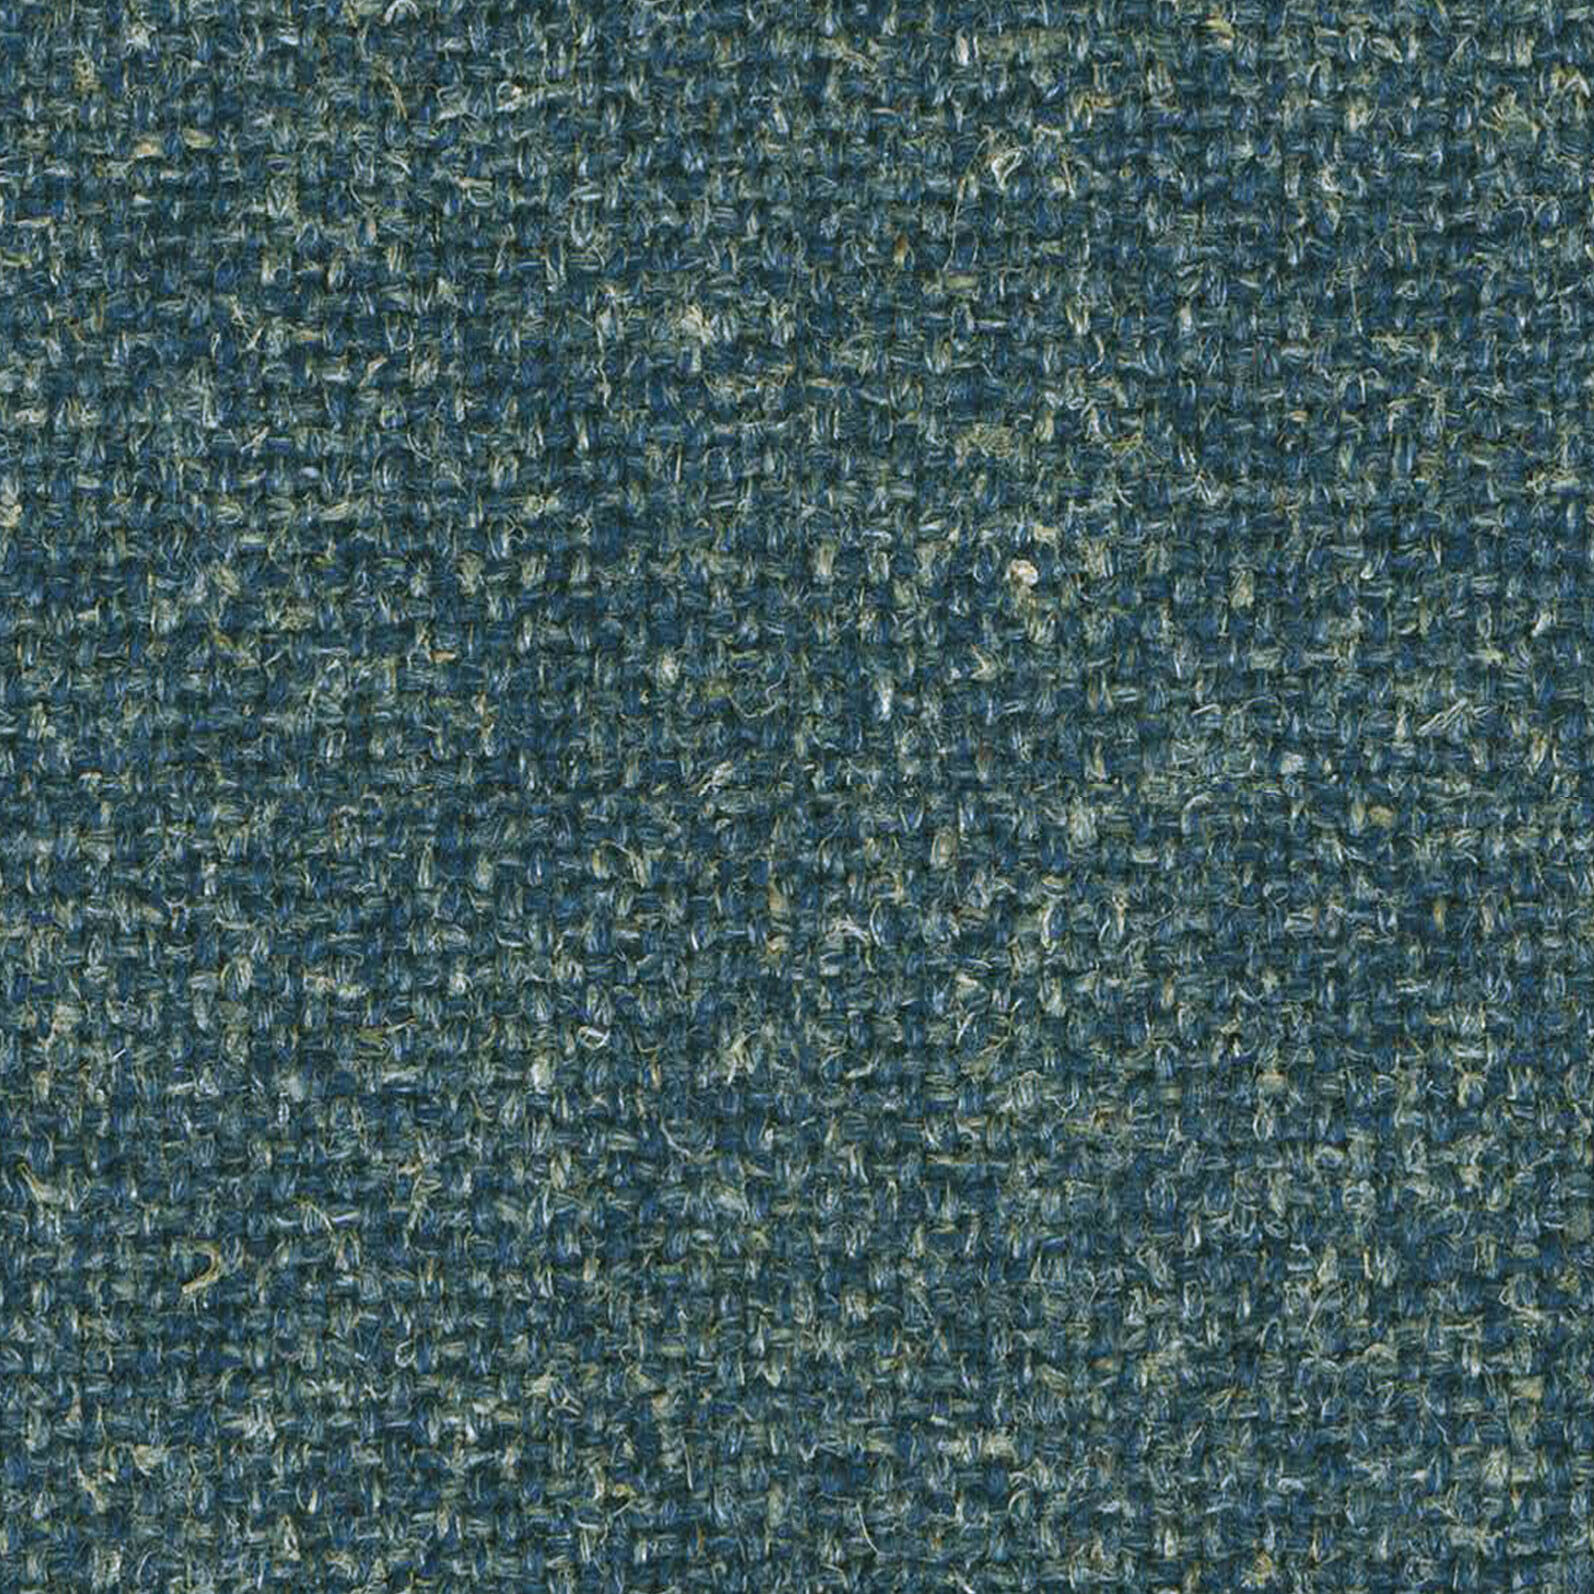 Camira Upholstery Fabric Hemp Trough Blue Wool 8.625 yards HWP20 PF